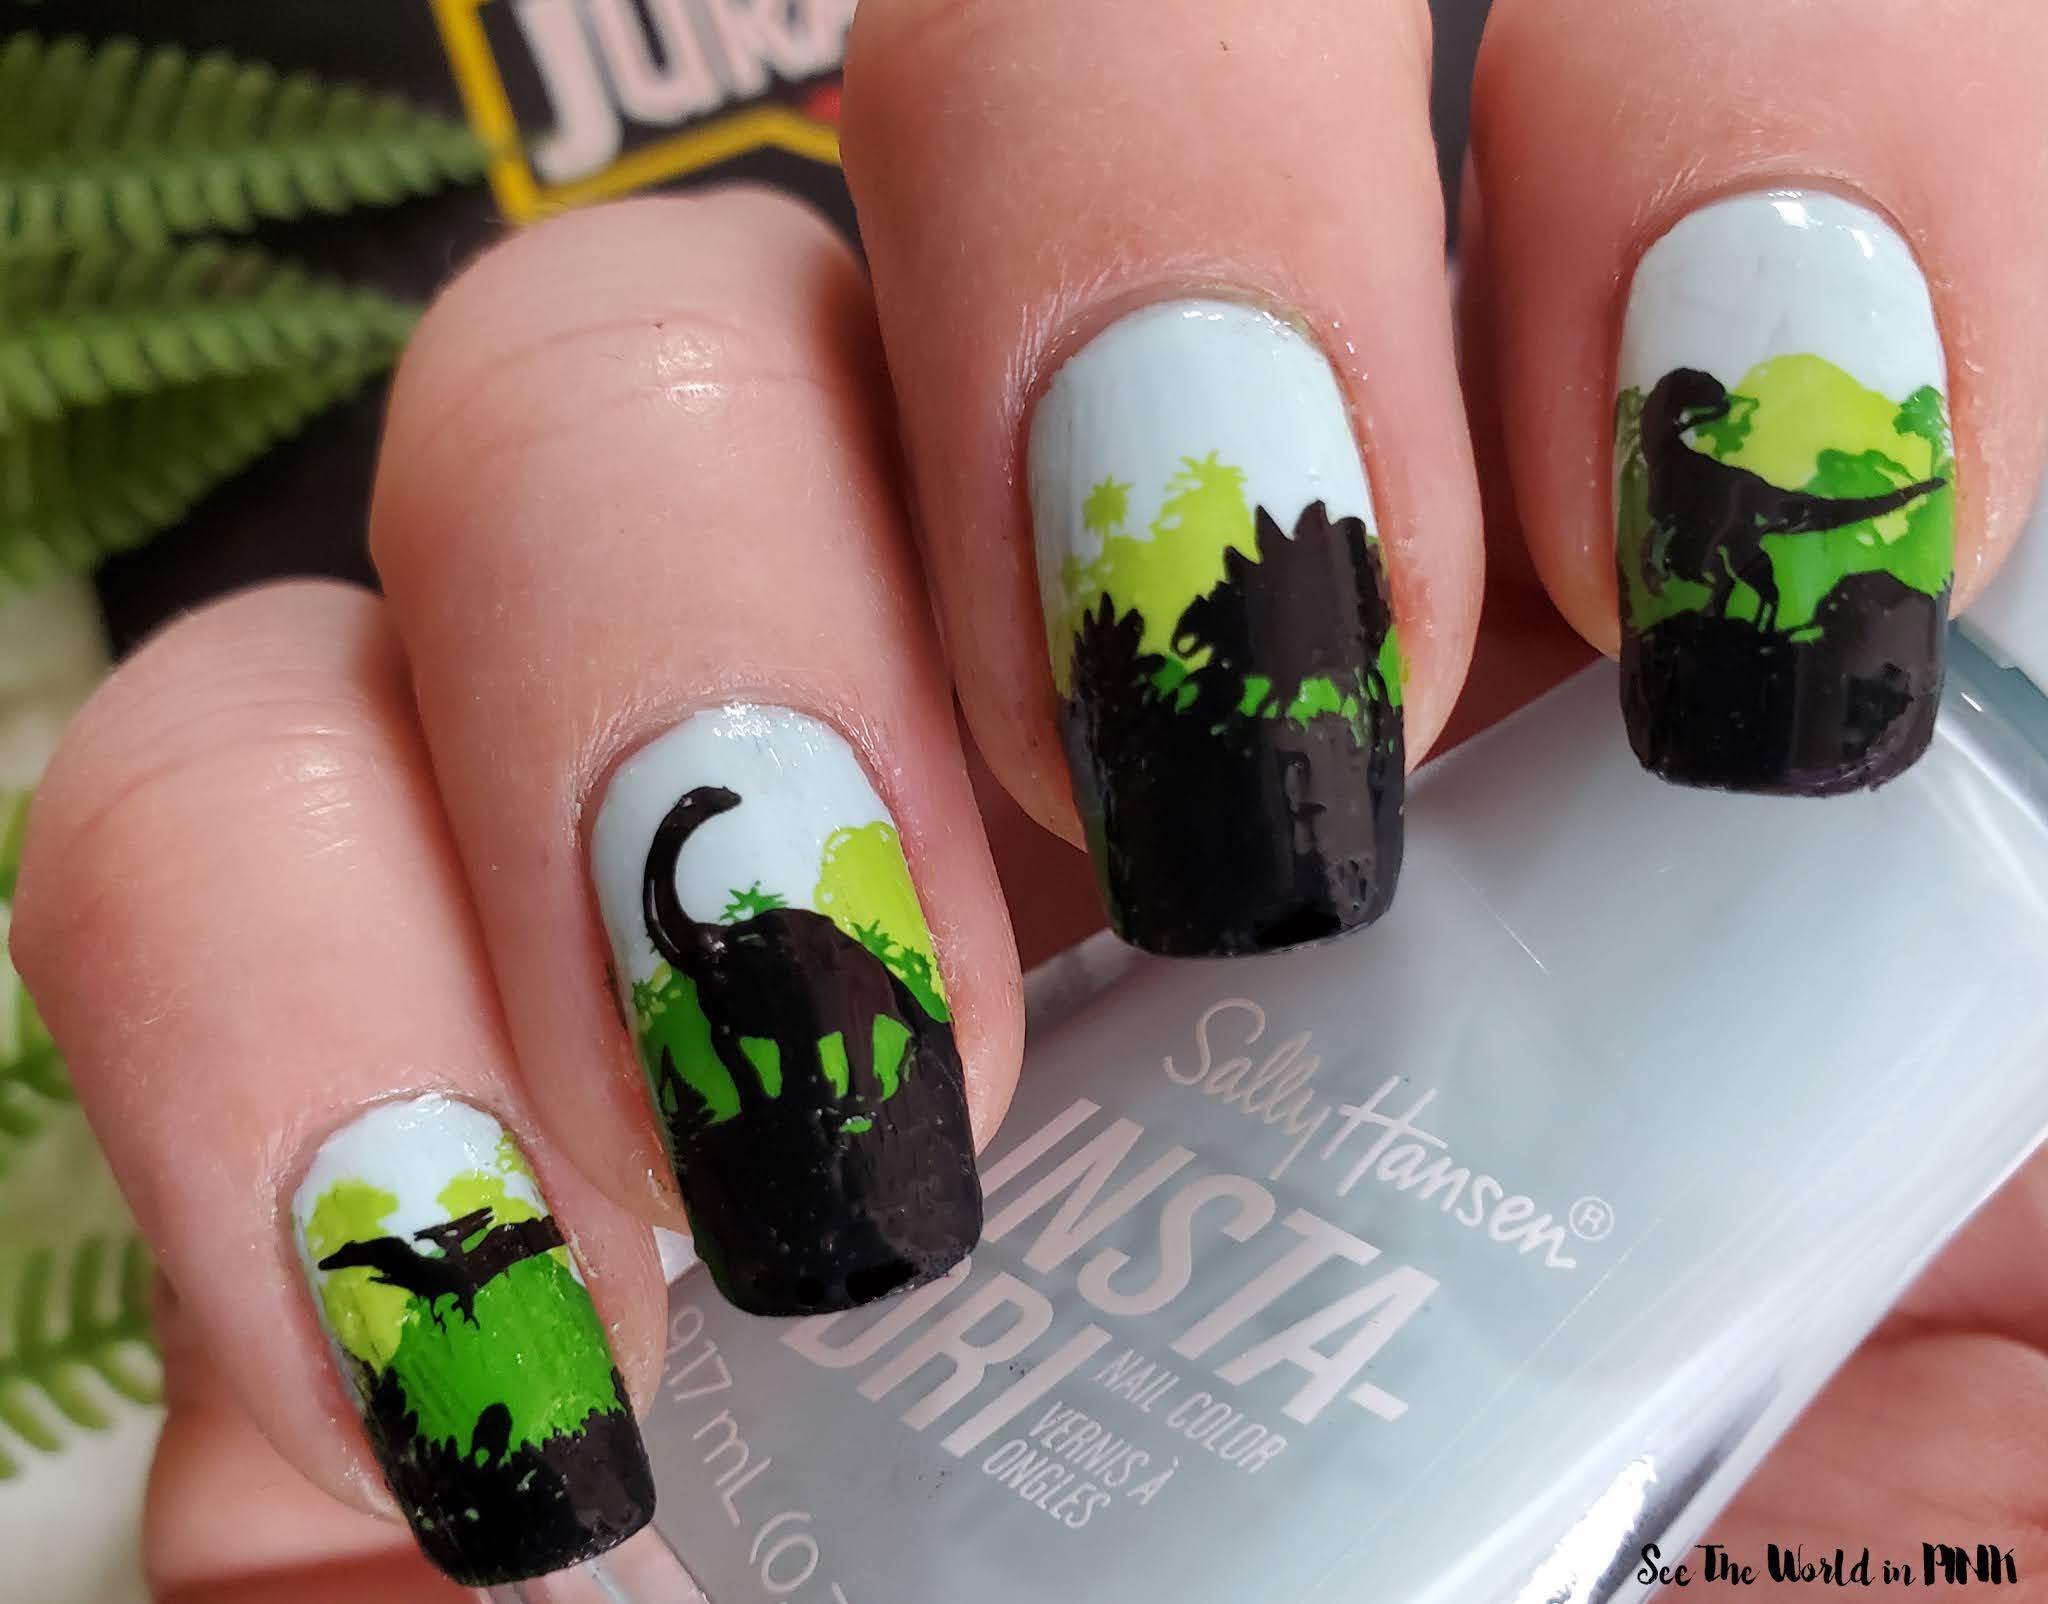 Manicure Monday - Stamped Jurassic Park Dinosaur Nails